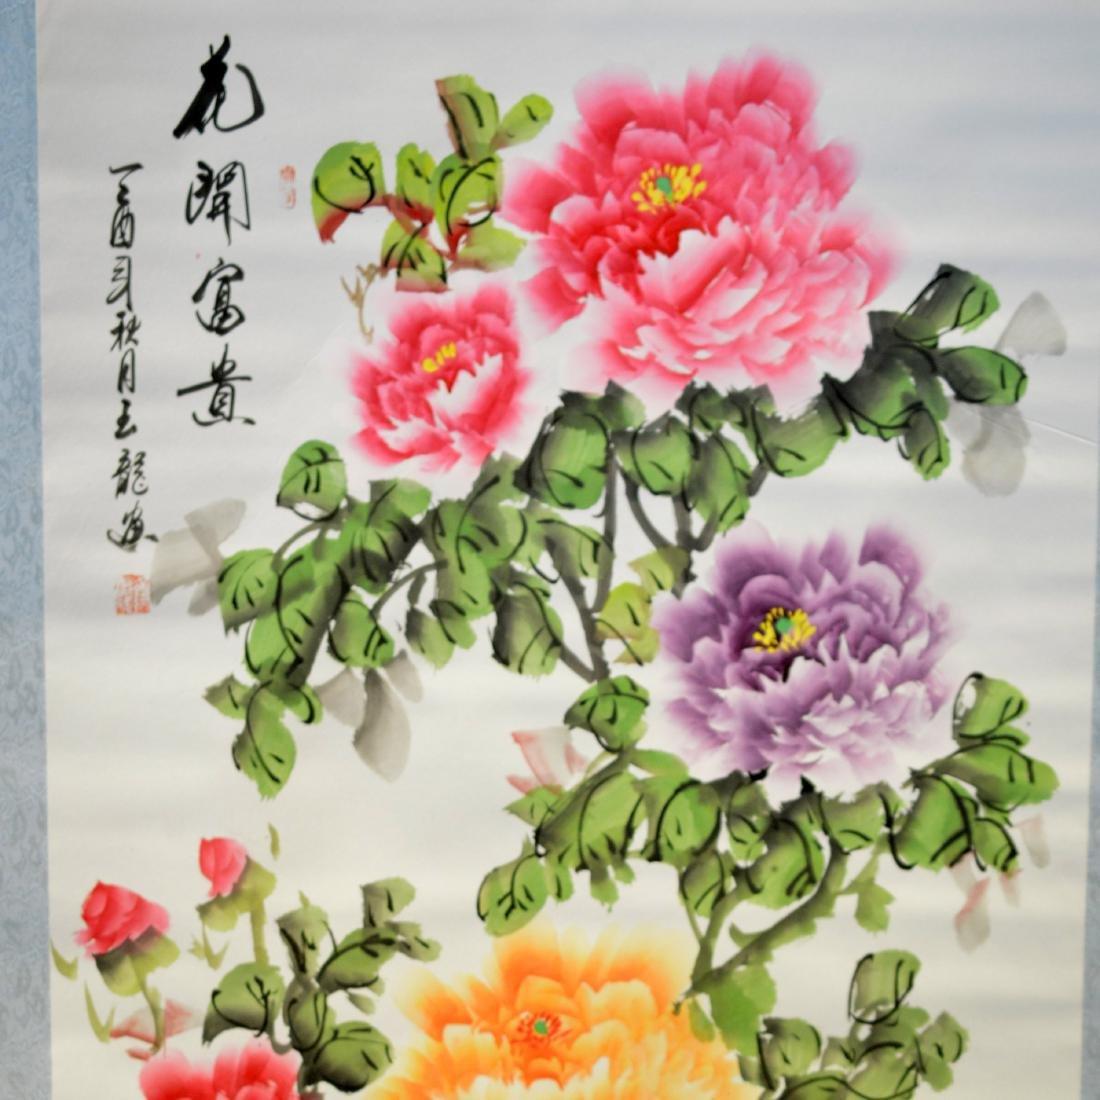 Flower Blossom Painting - 2